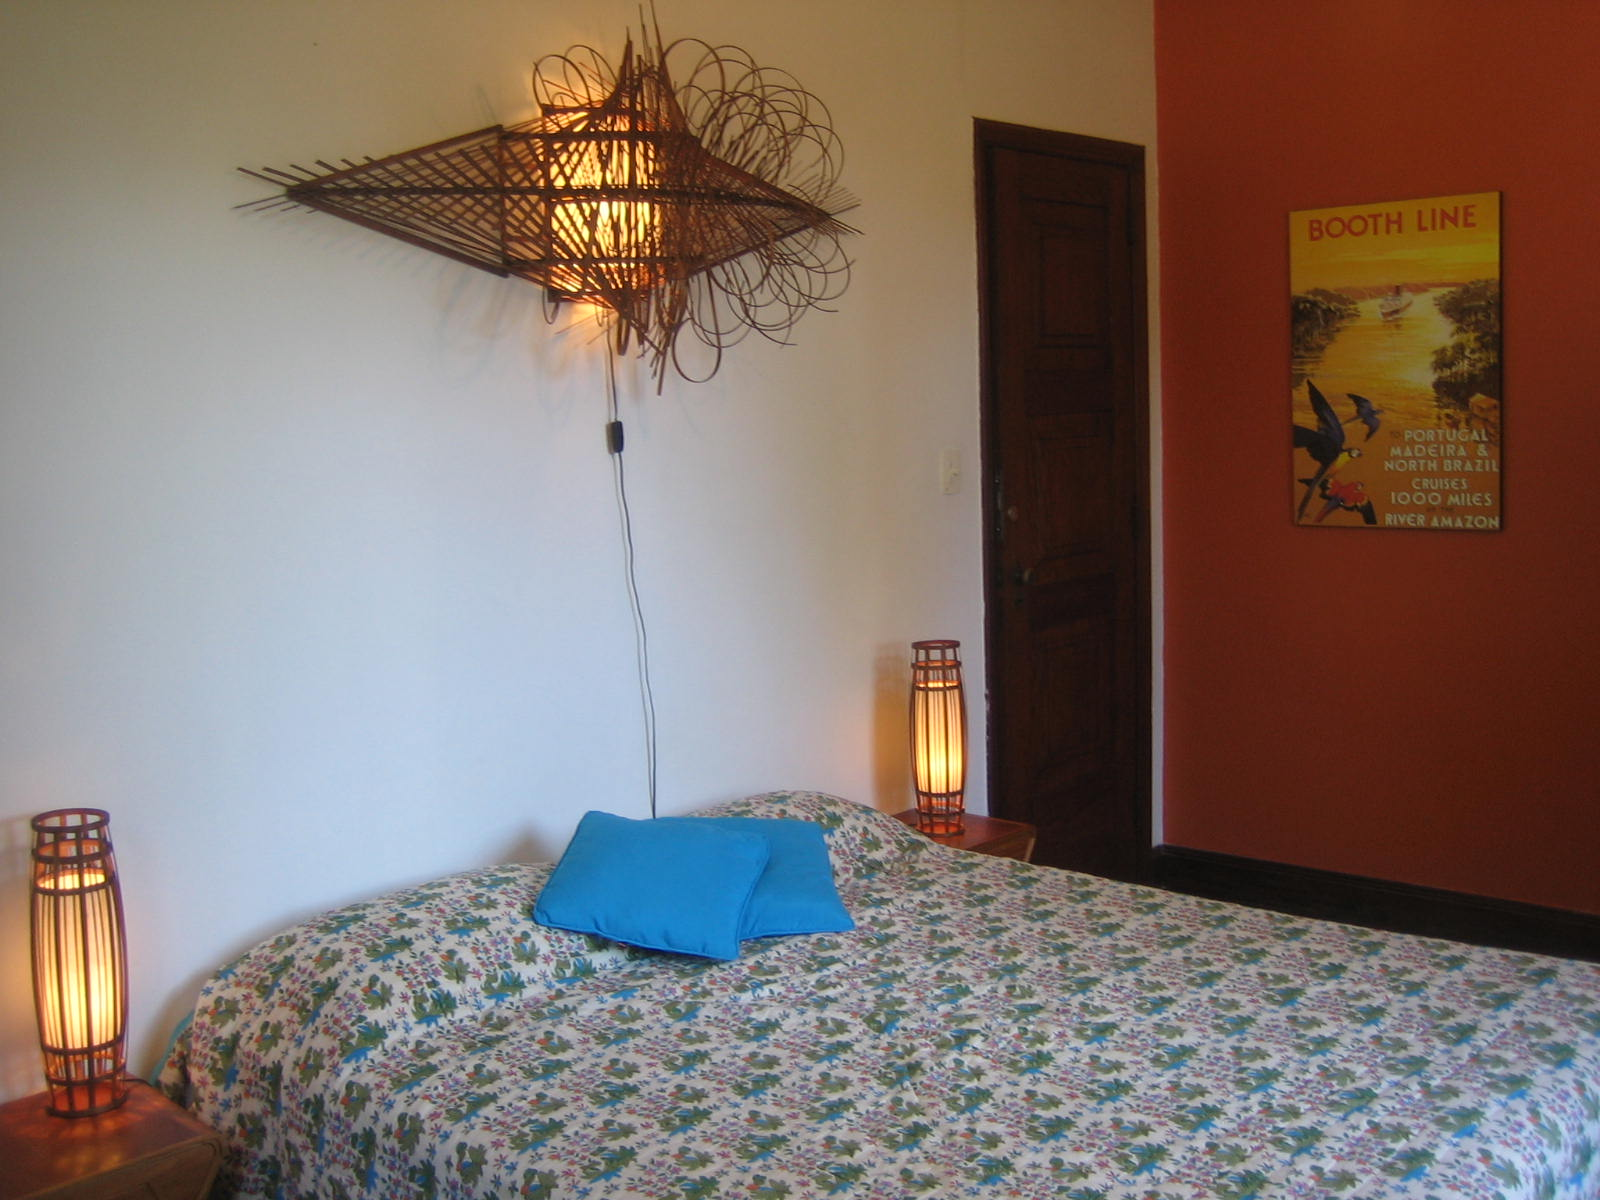 Local artisans lamp features